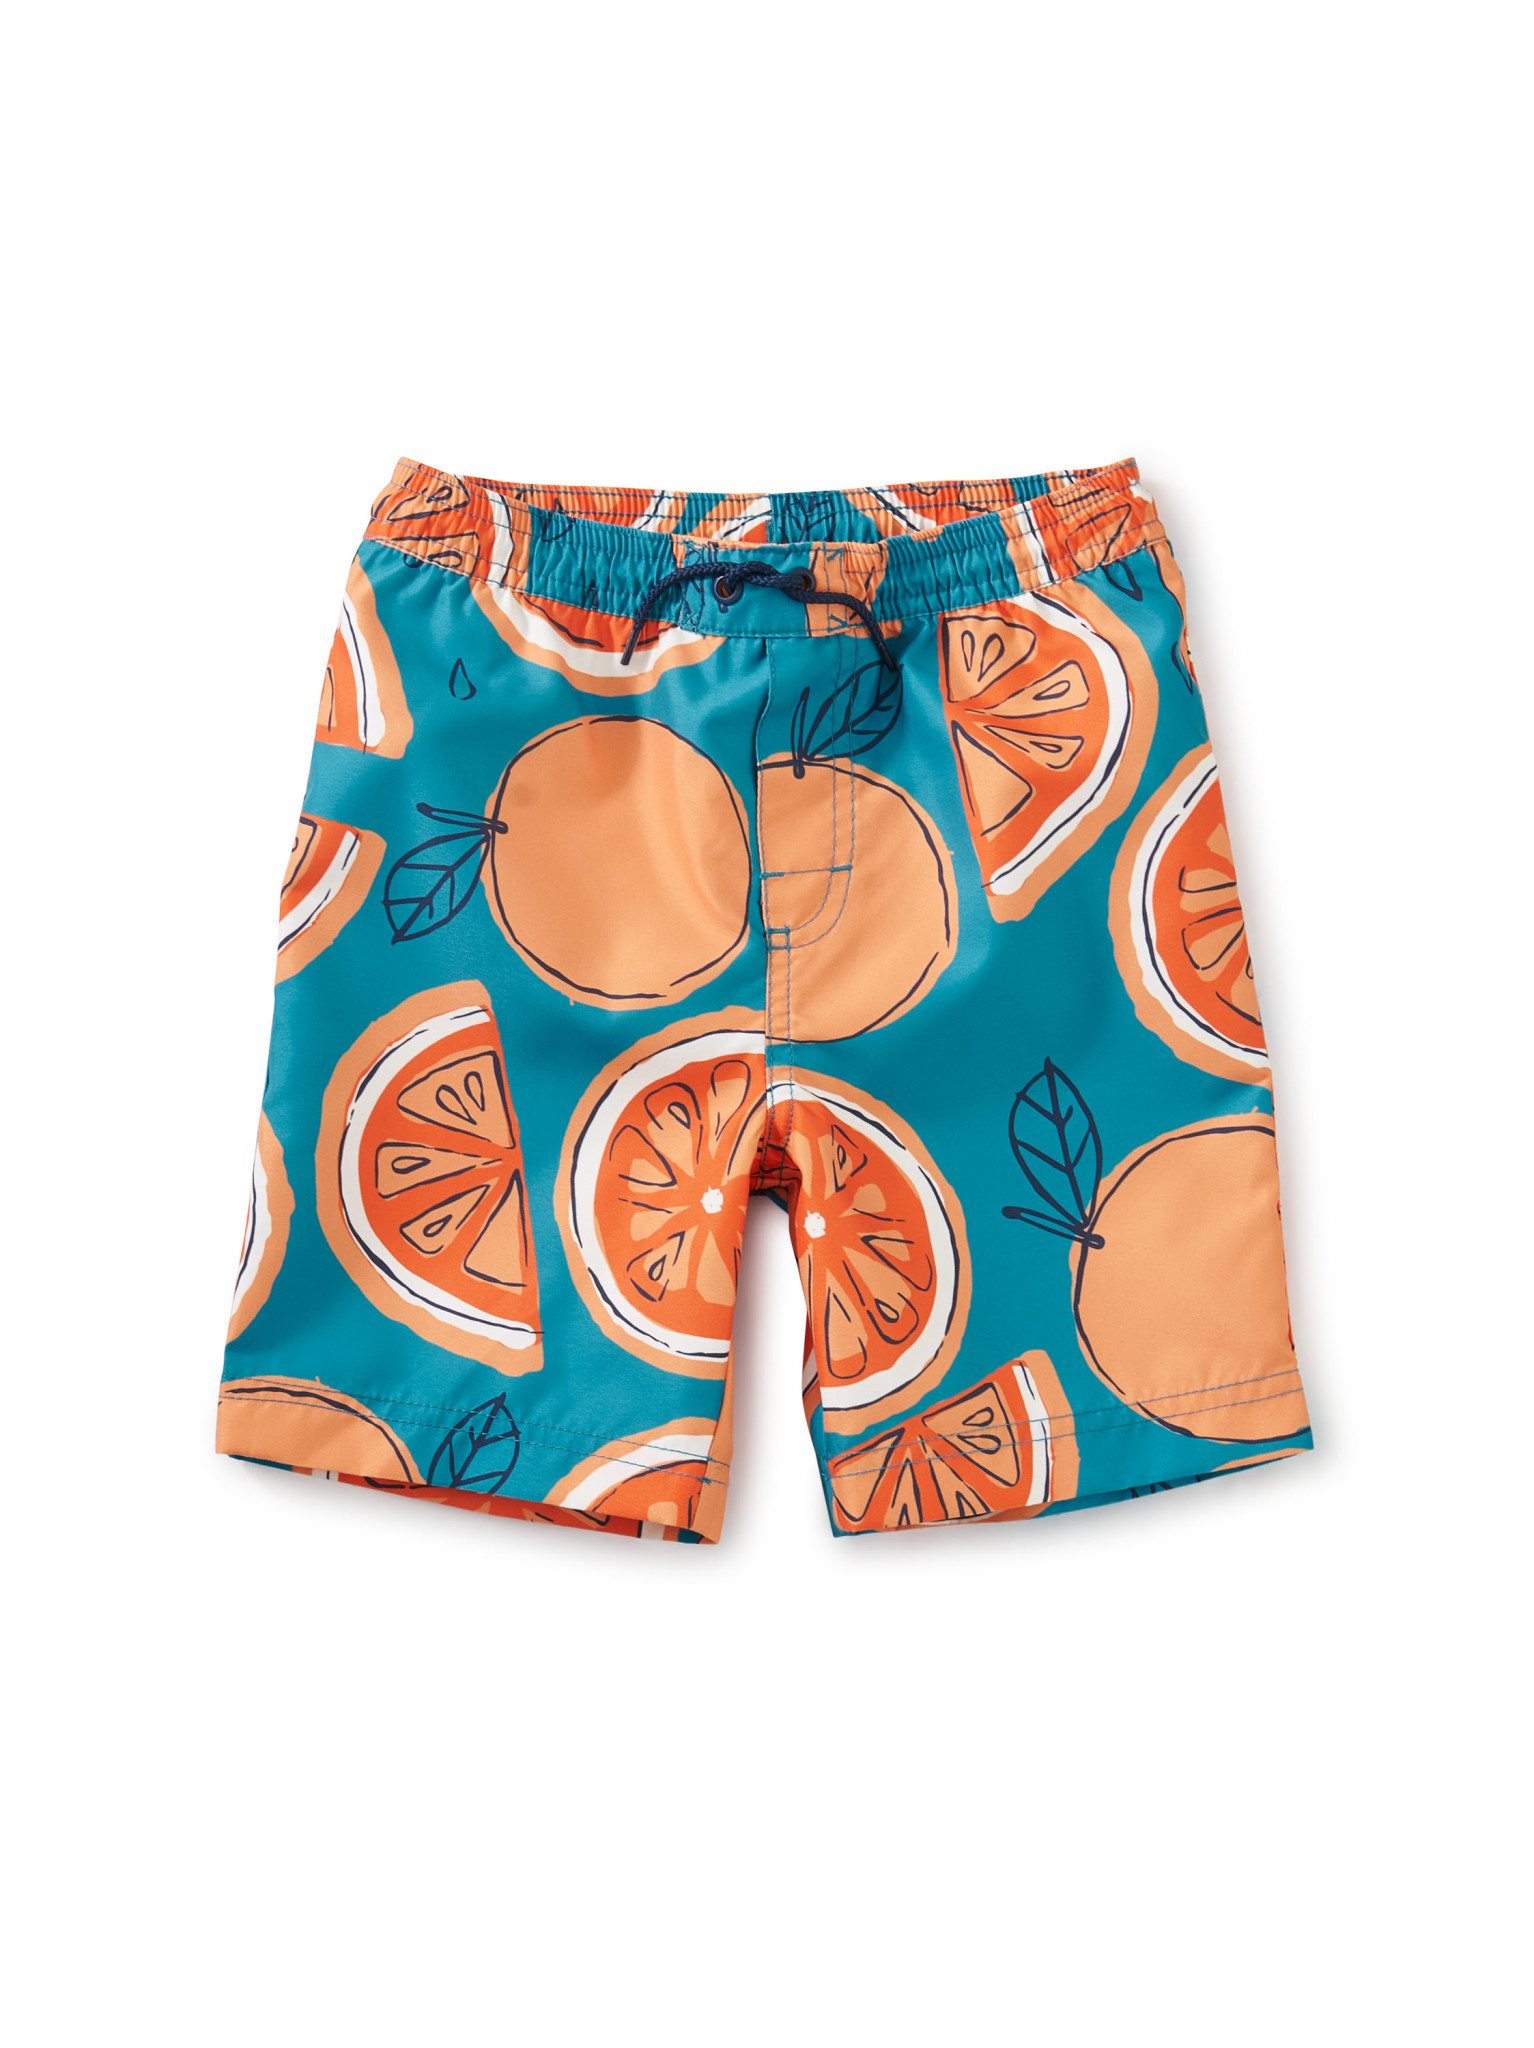 Tea Collection Swim Trunks - Fresh Oranges